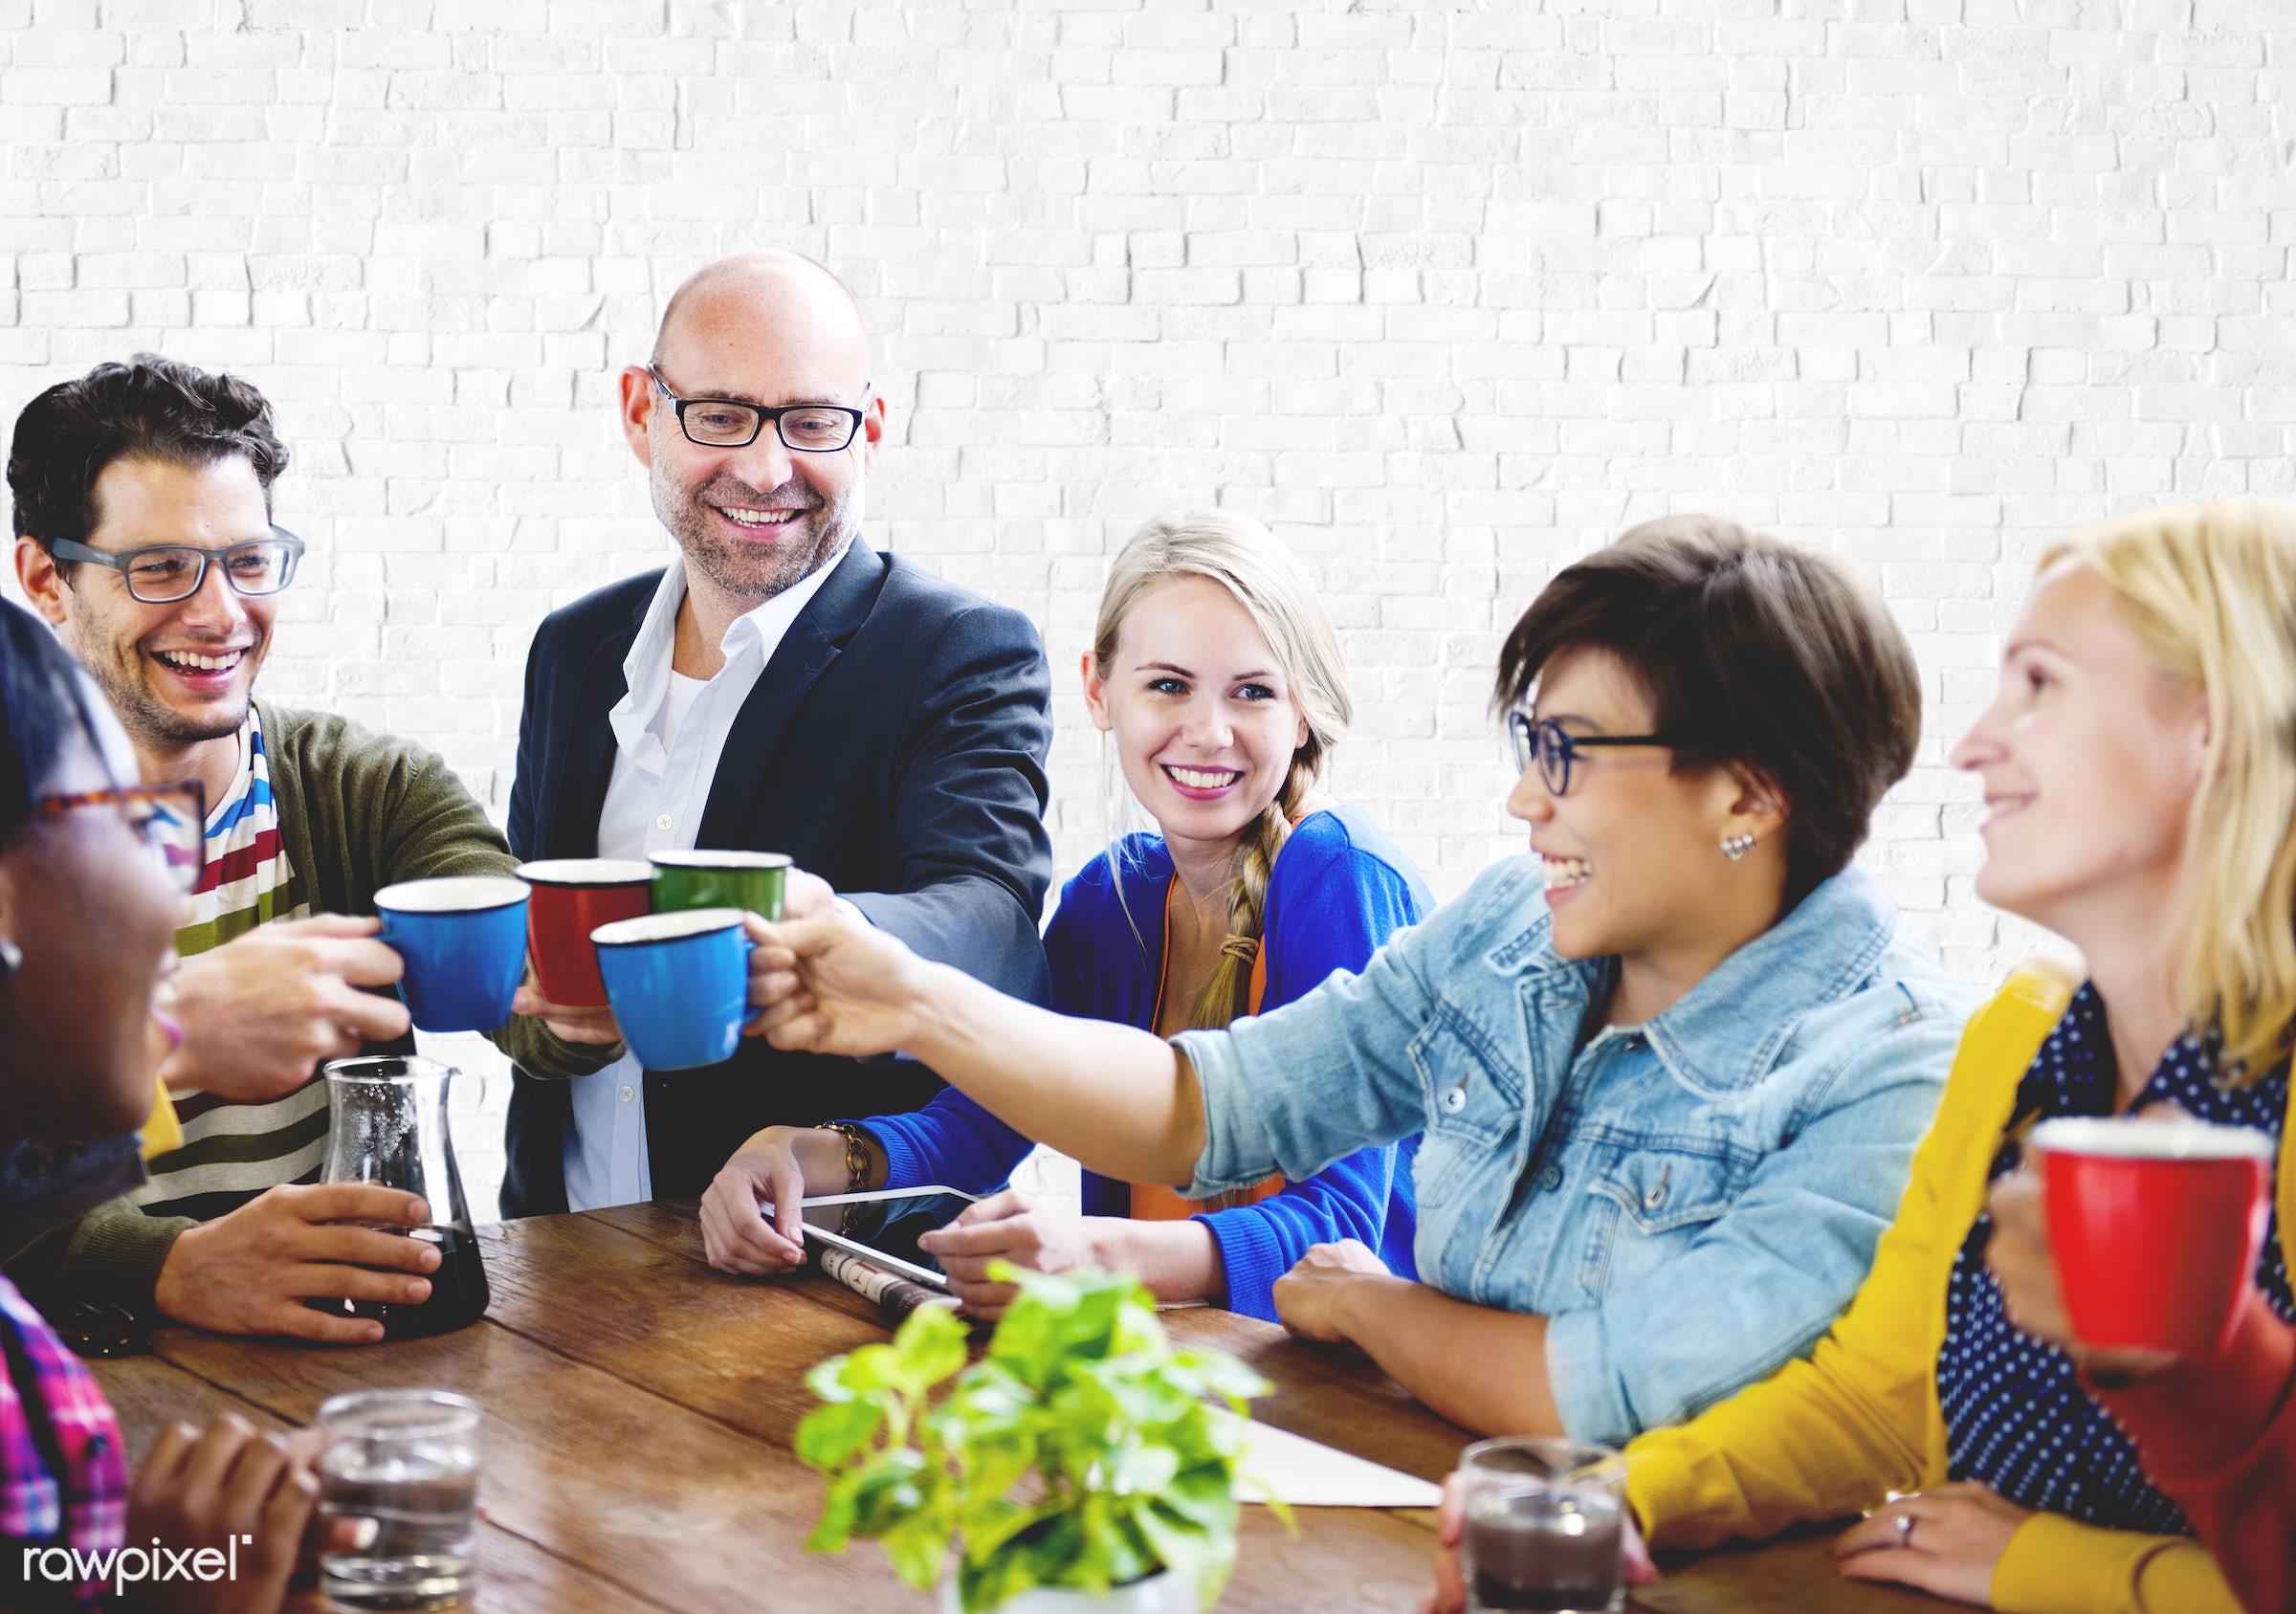 african descent, asian ethnicity, bonding, break, brick, cafe, casual, cheerful, coffee, coffee break, communication,...